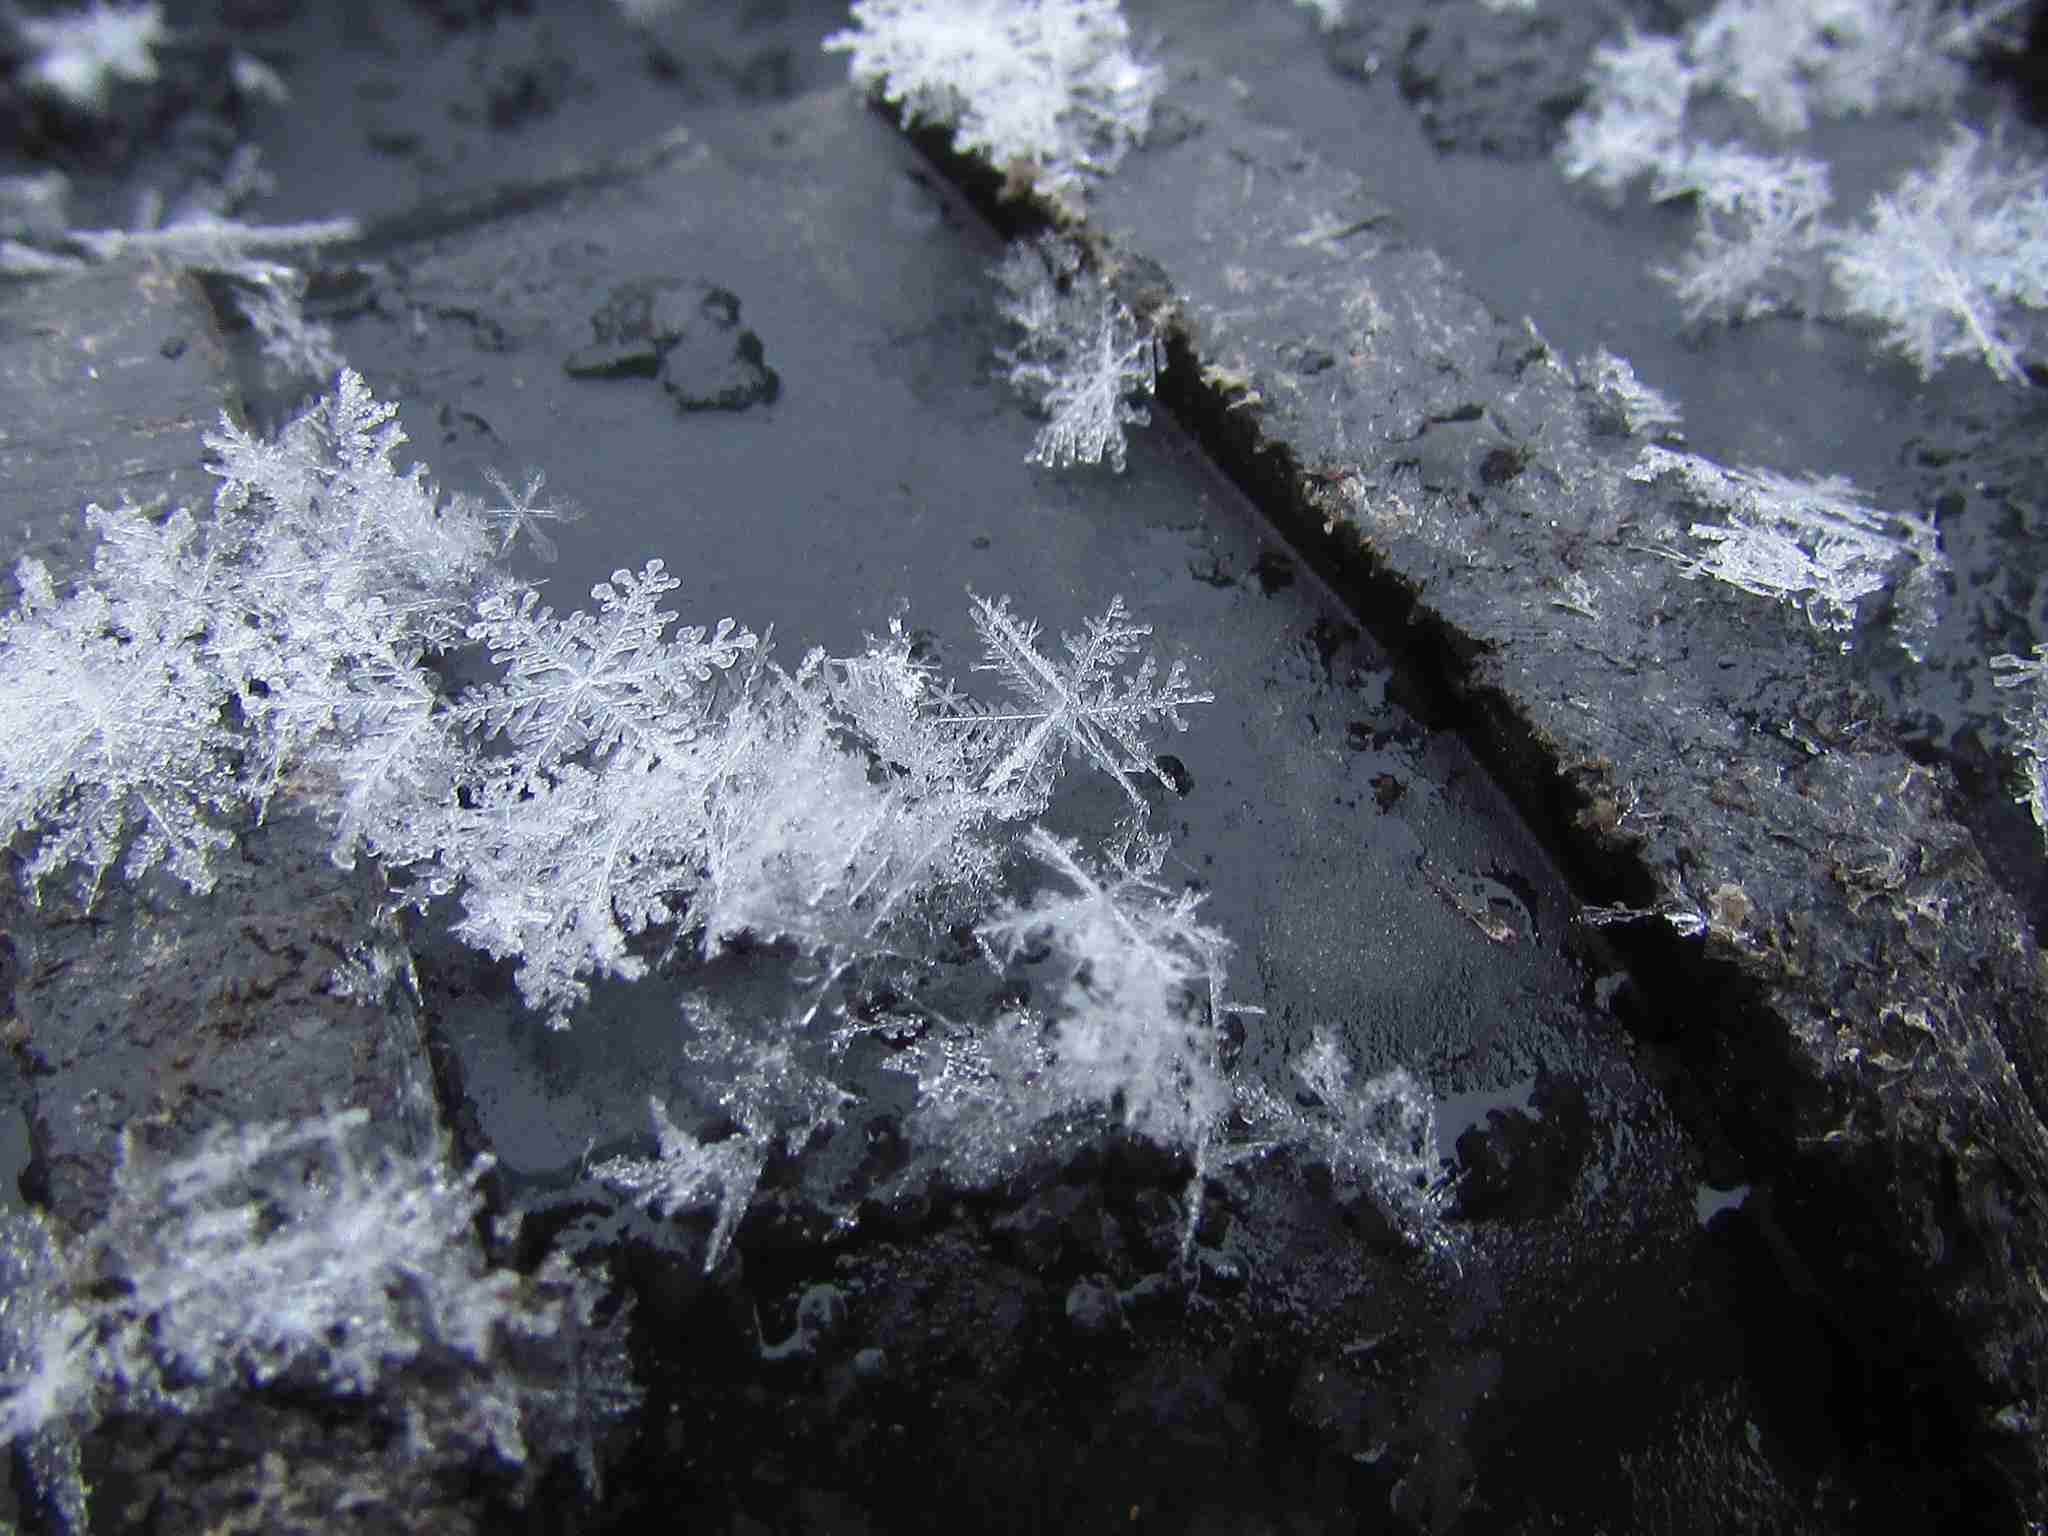 Closeup photo of snowflakes